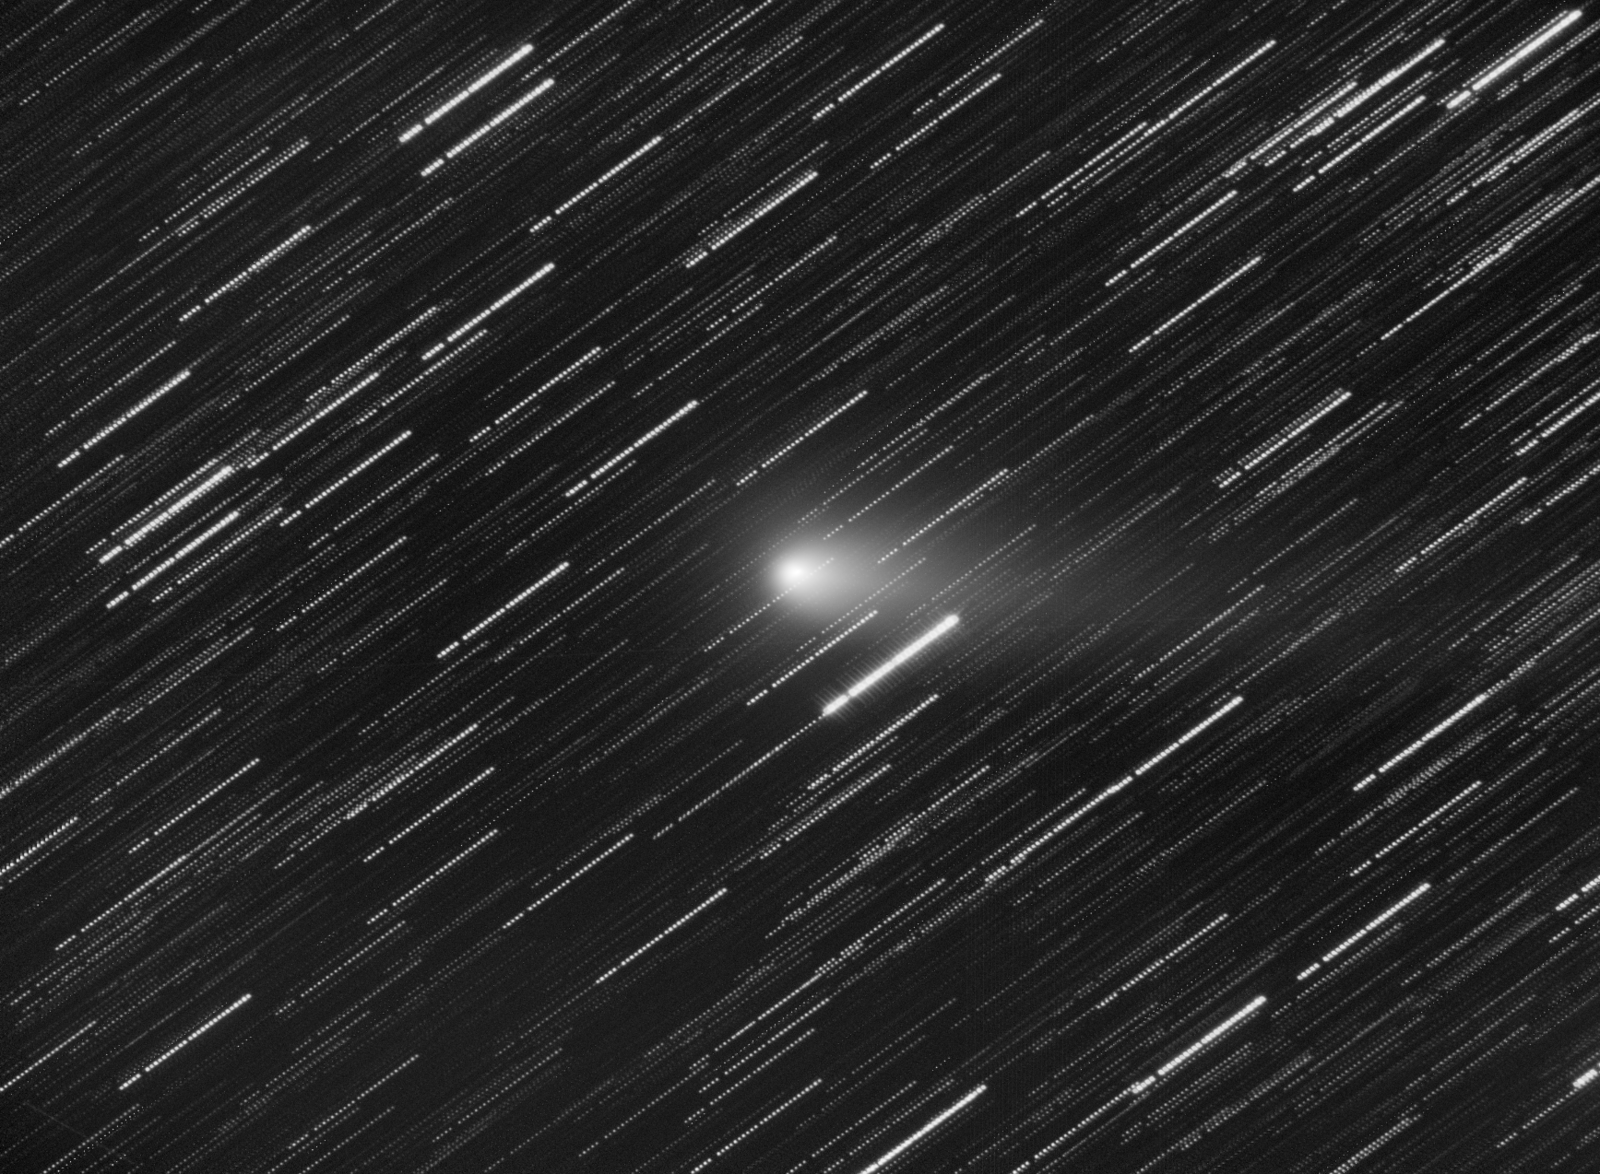 1060915059_21PGiacobini_Zinnerintegration_ABE_Resample-cometstack.thumb.png.2644af0f27e8048c9004a02881f4f6d8.png